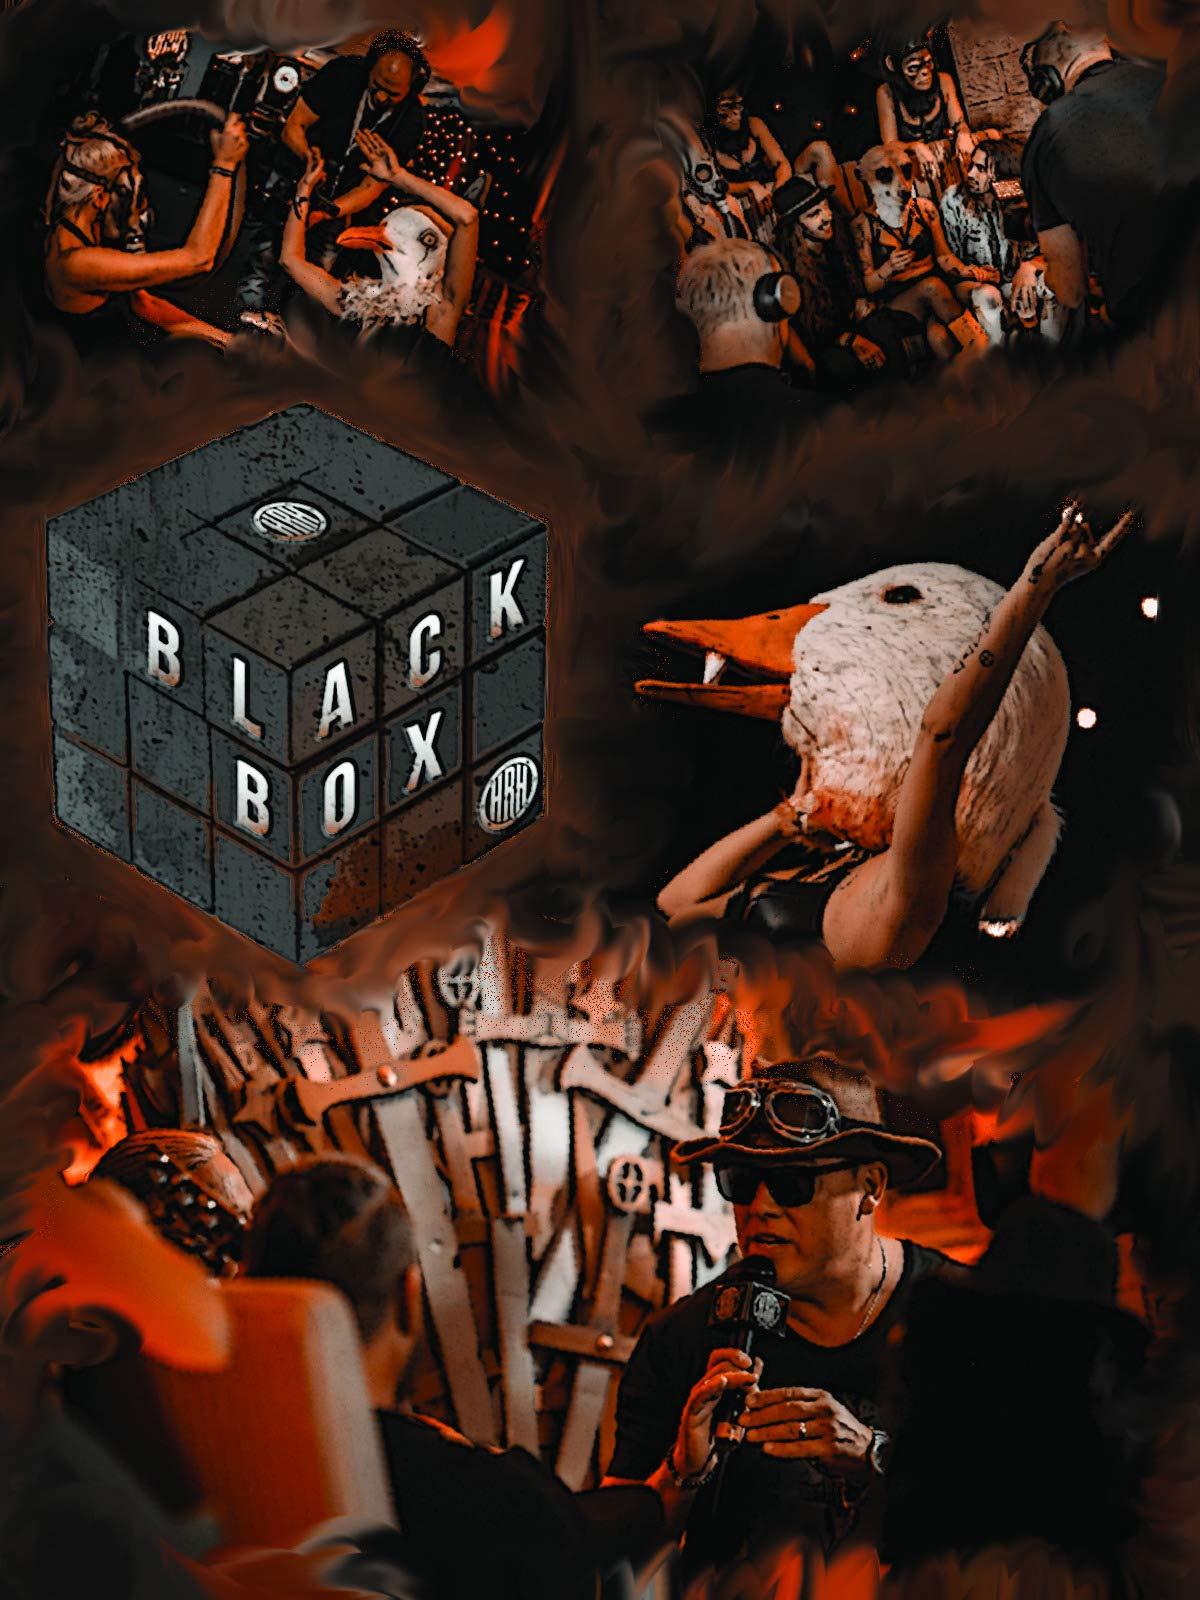 HRH Black Box